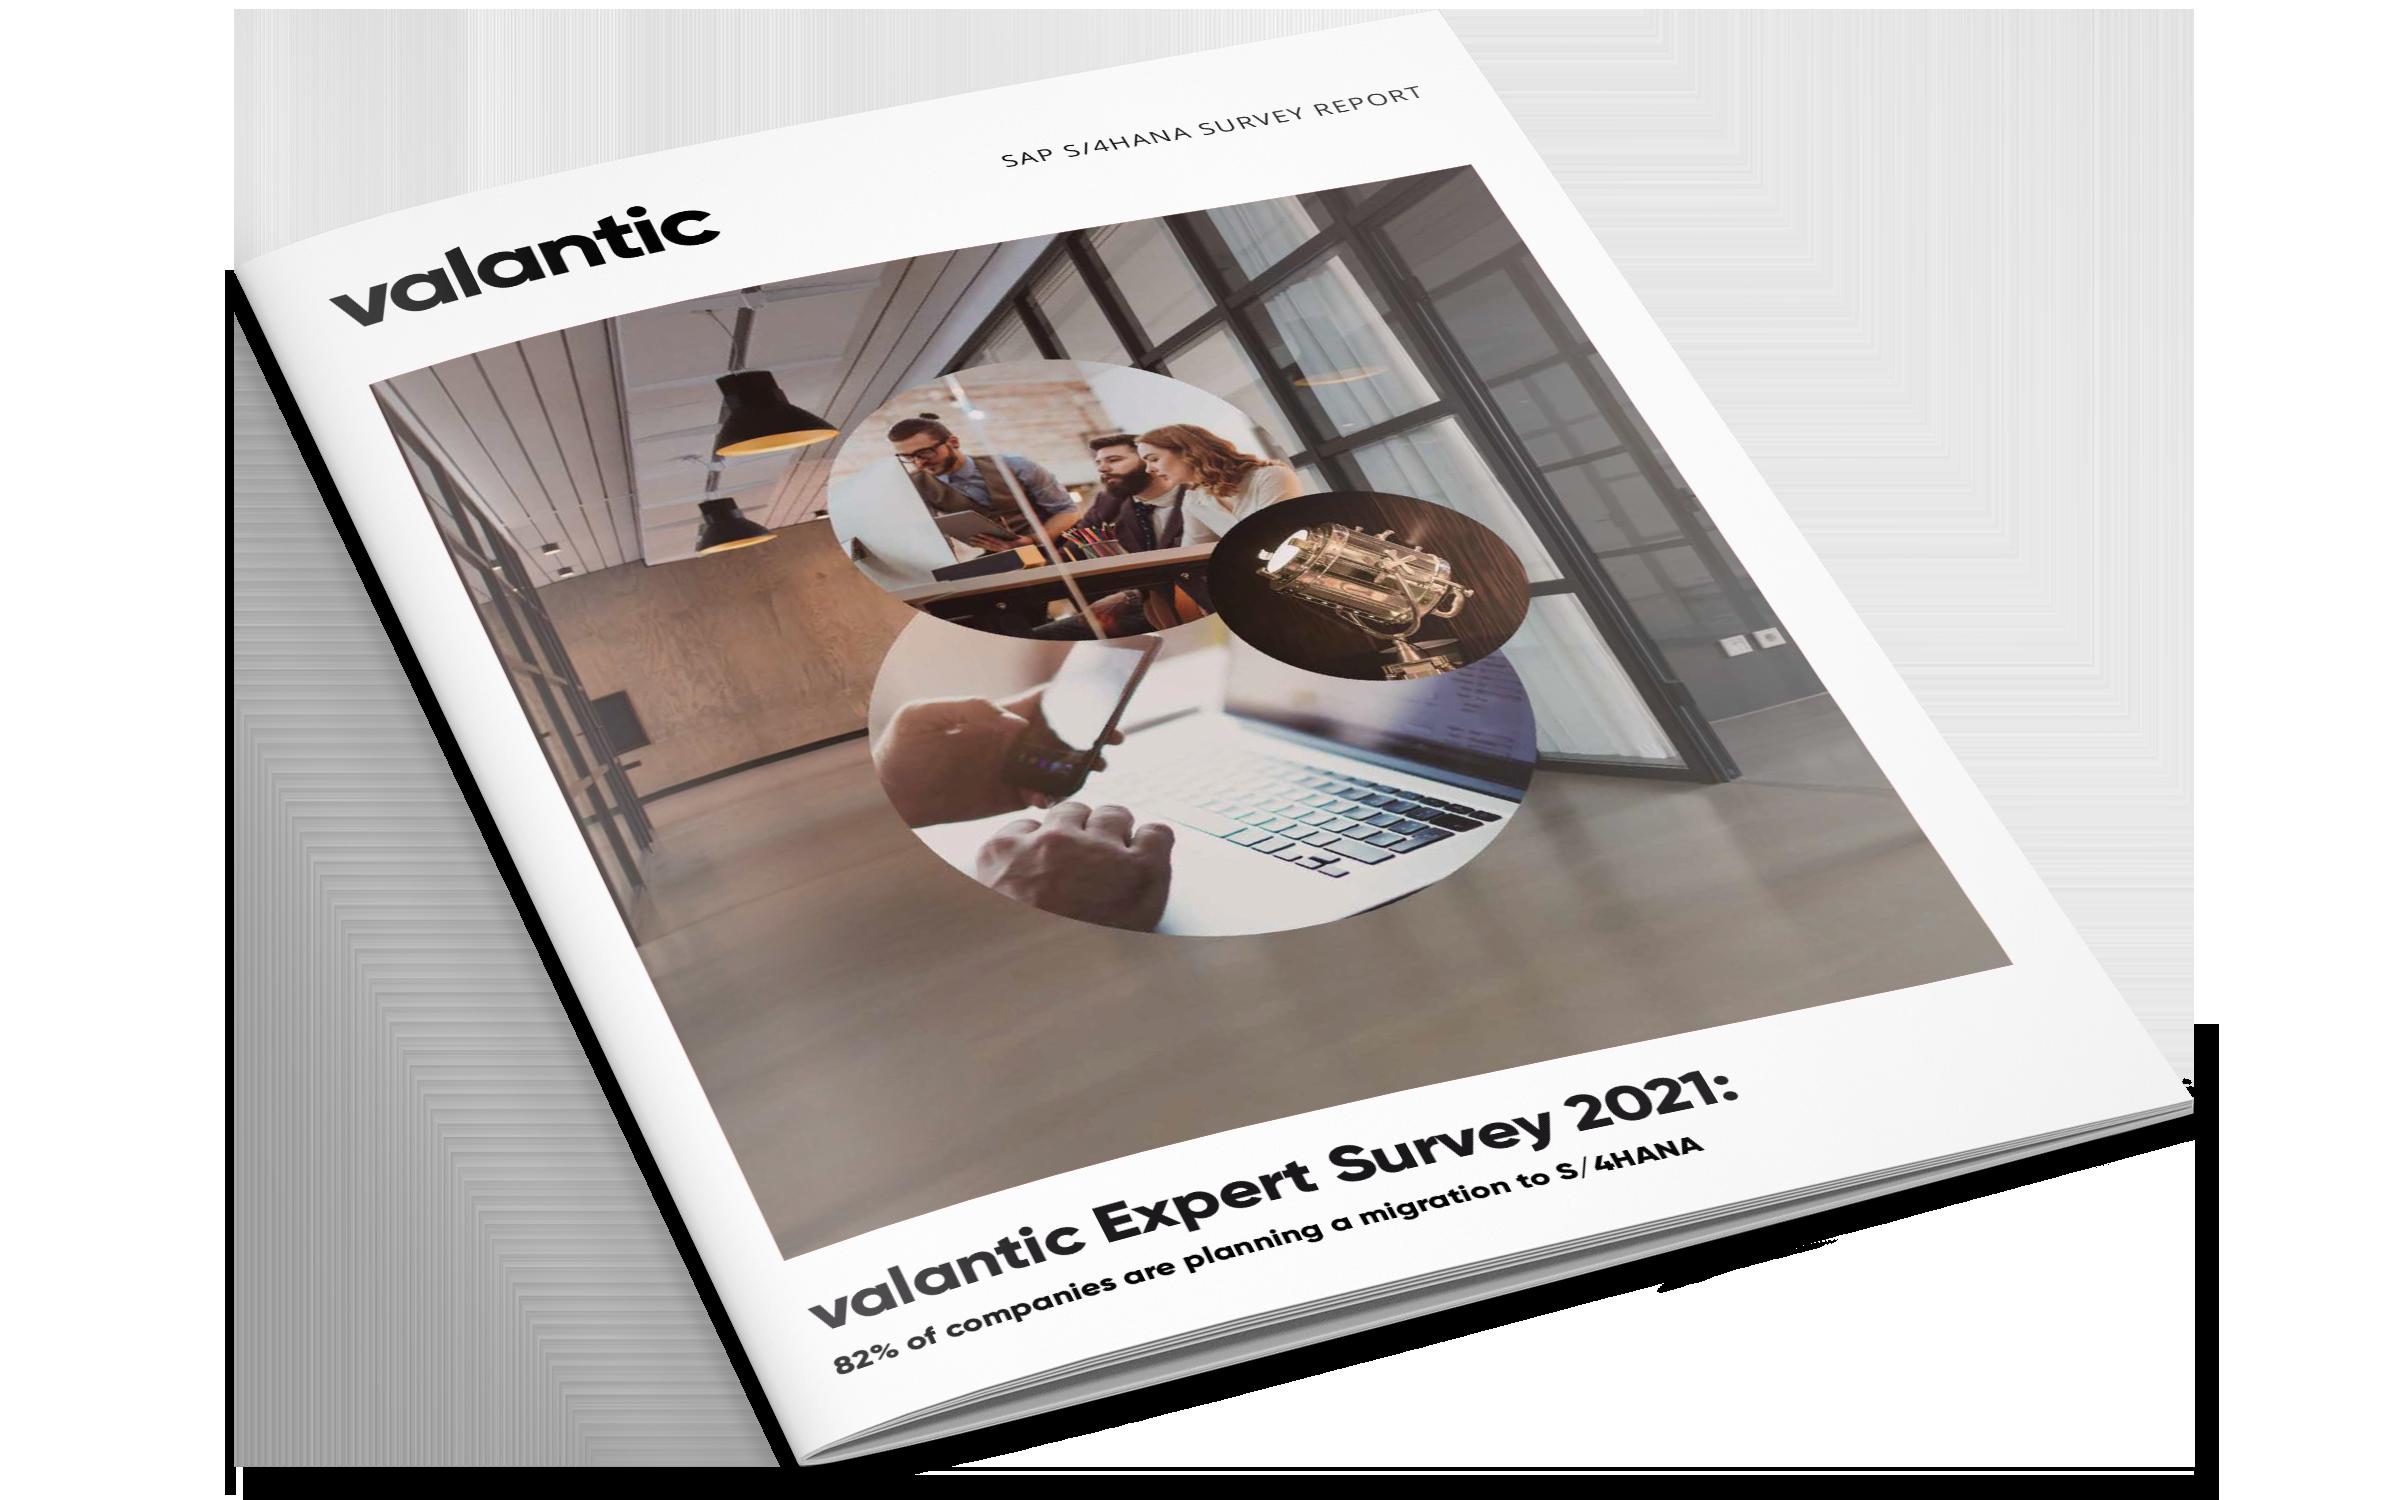 Cover of the Study Report on valantics SAP S/4HANA Expert Survey